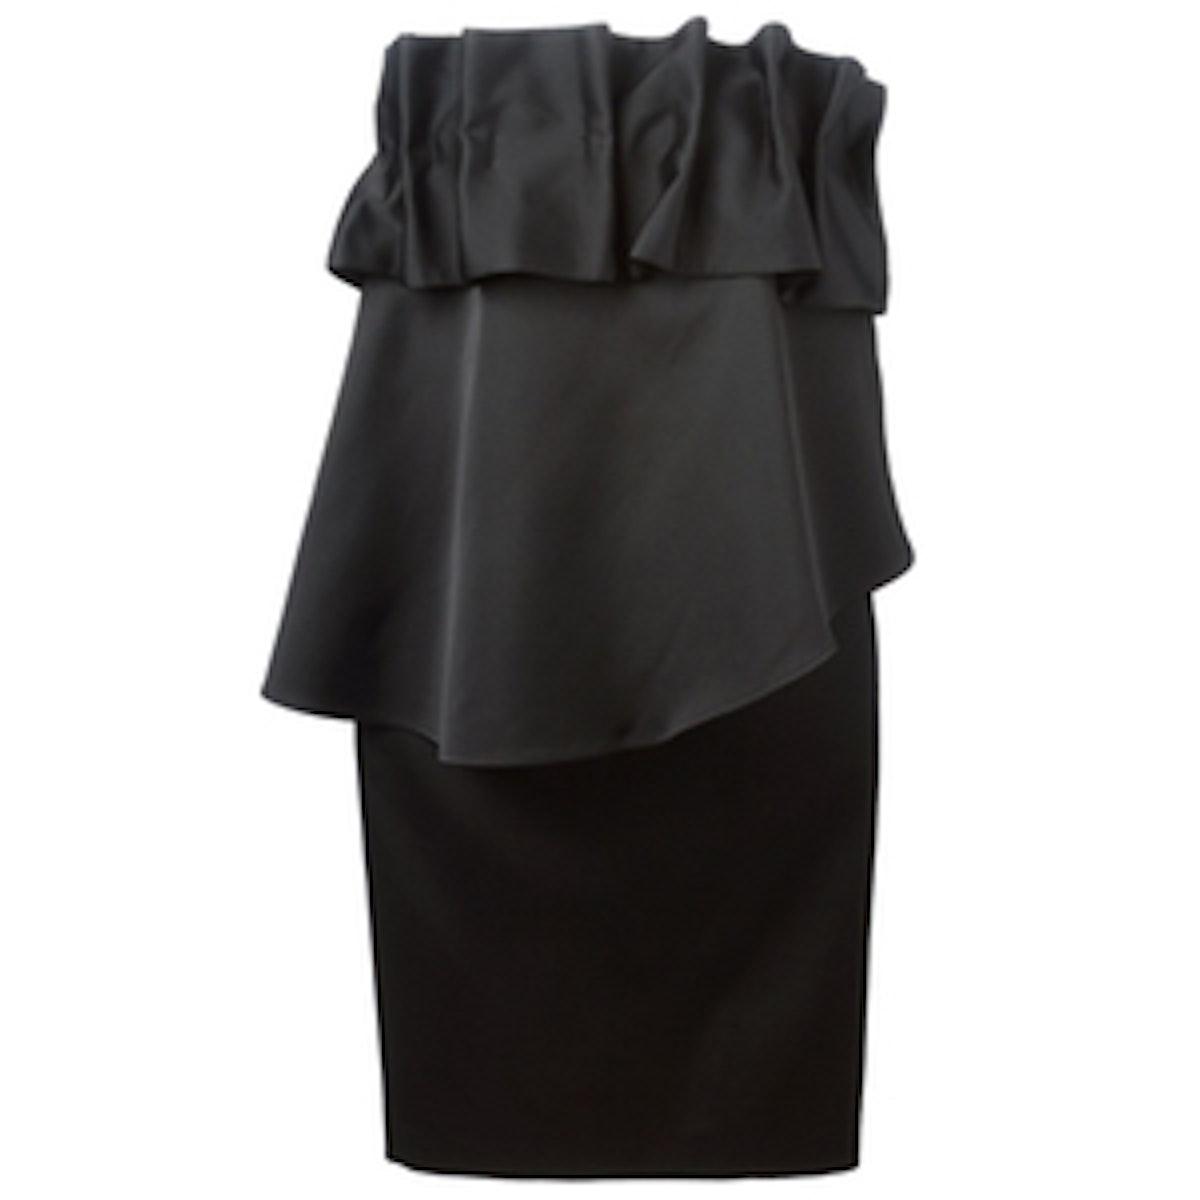 Serendipity Ruffled Dress